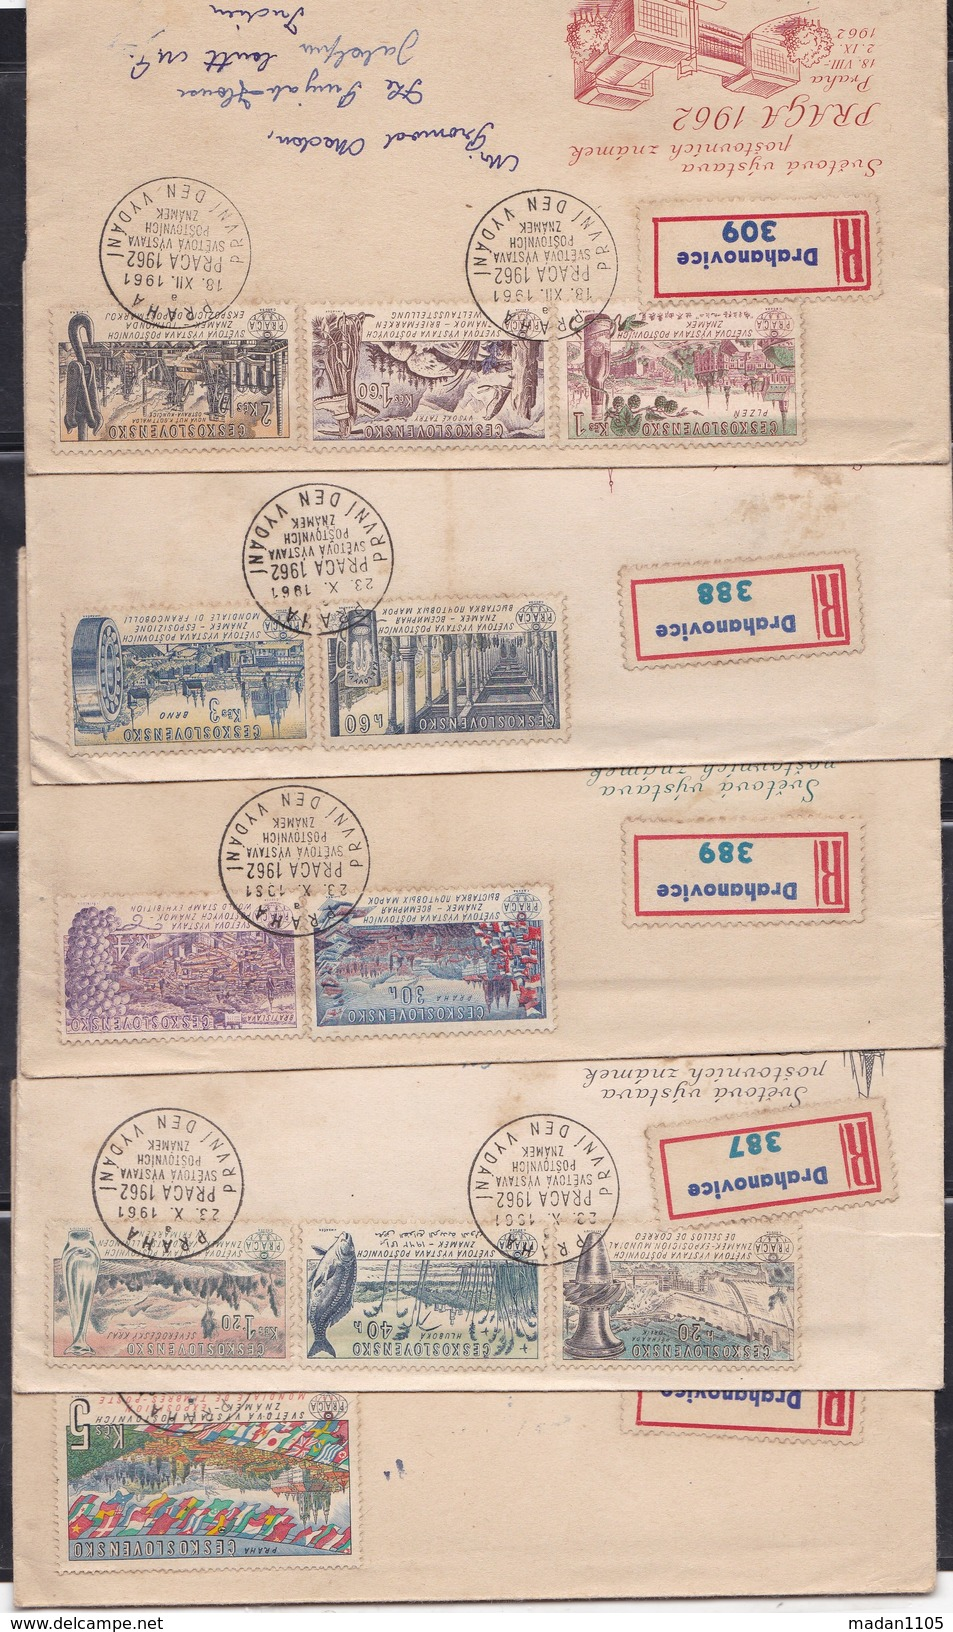 CZECHOSLOVAKIA, 1961, Set Of 5 FDC's,  Prelude To 1962 Praga International Philatelic Exhibition - Tschechoslowakei/CSSR